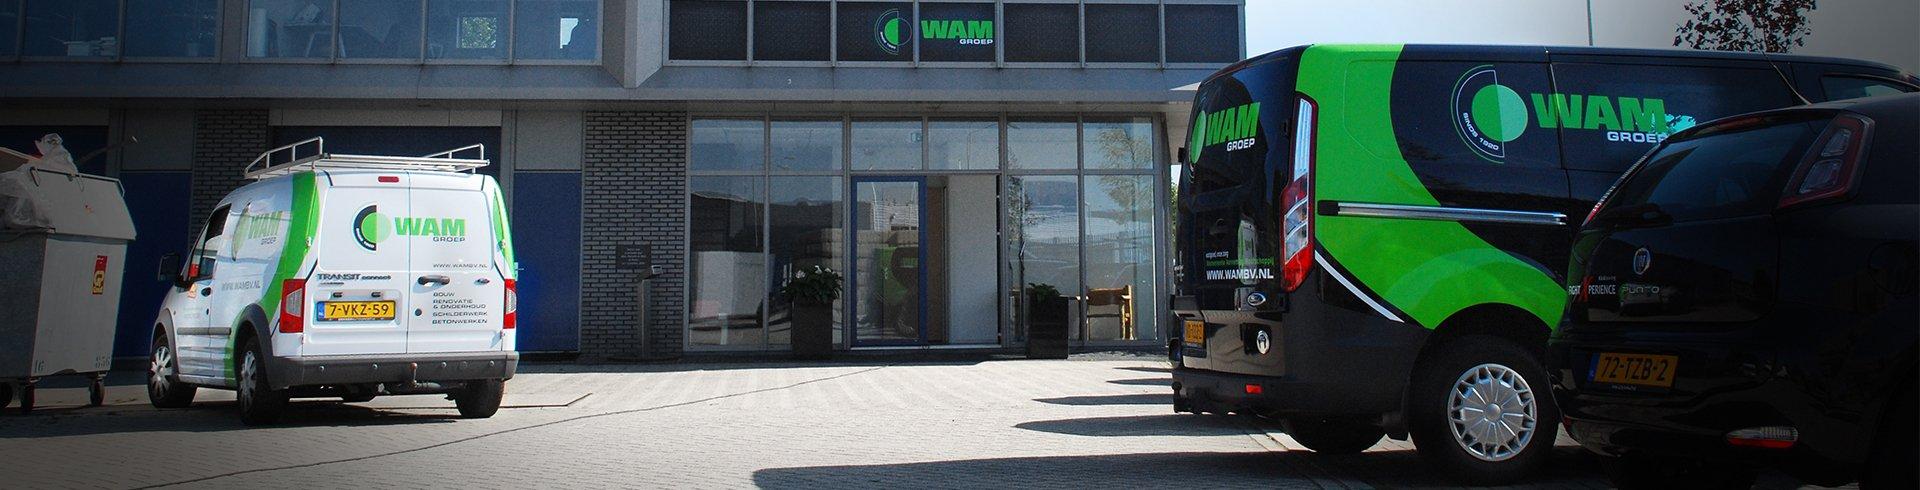 wam-service